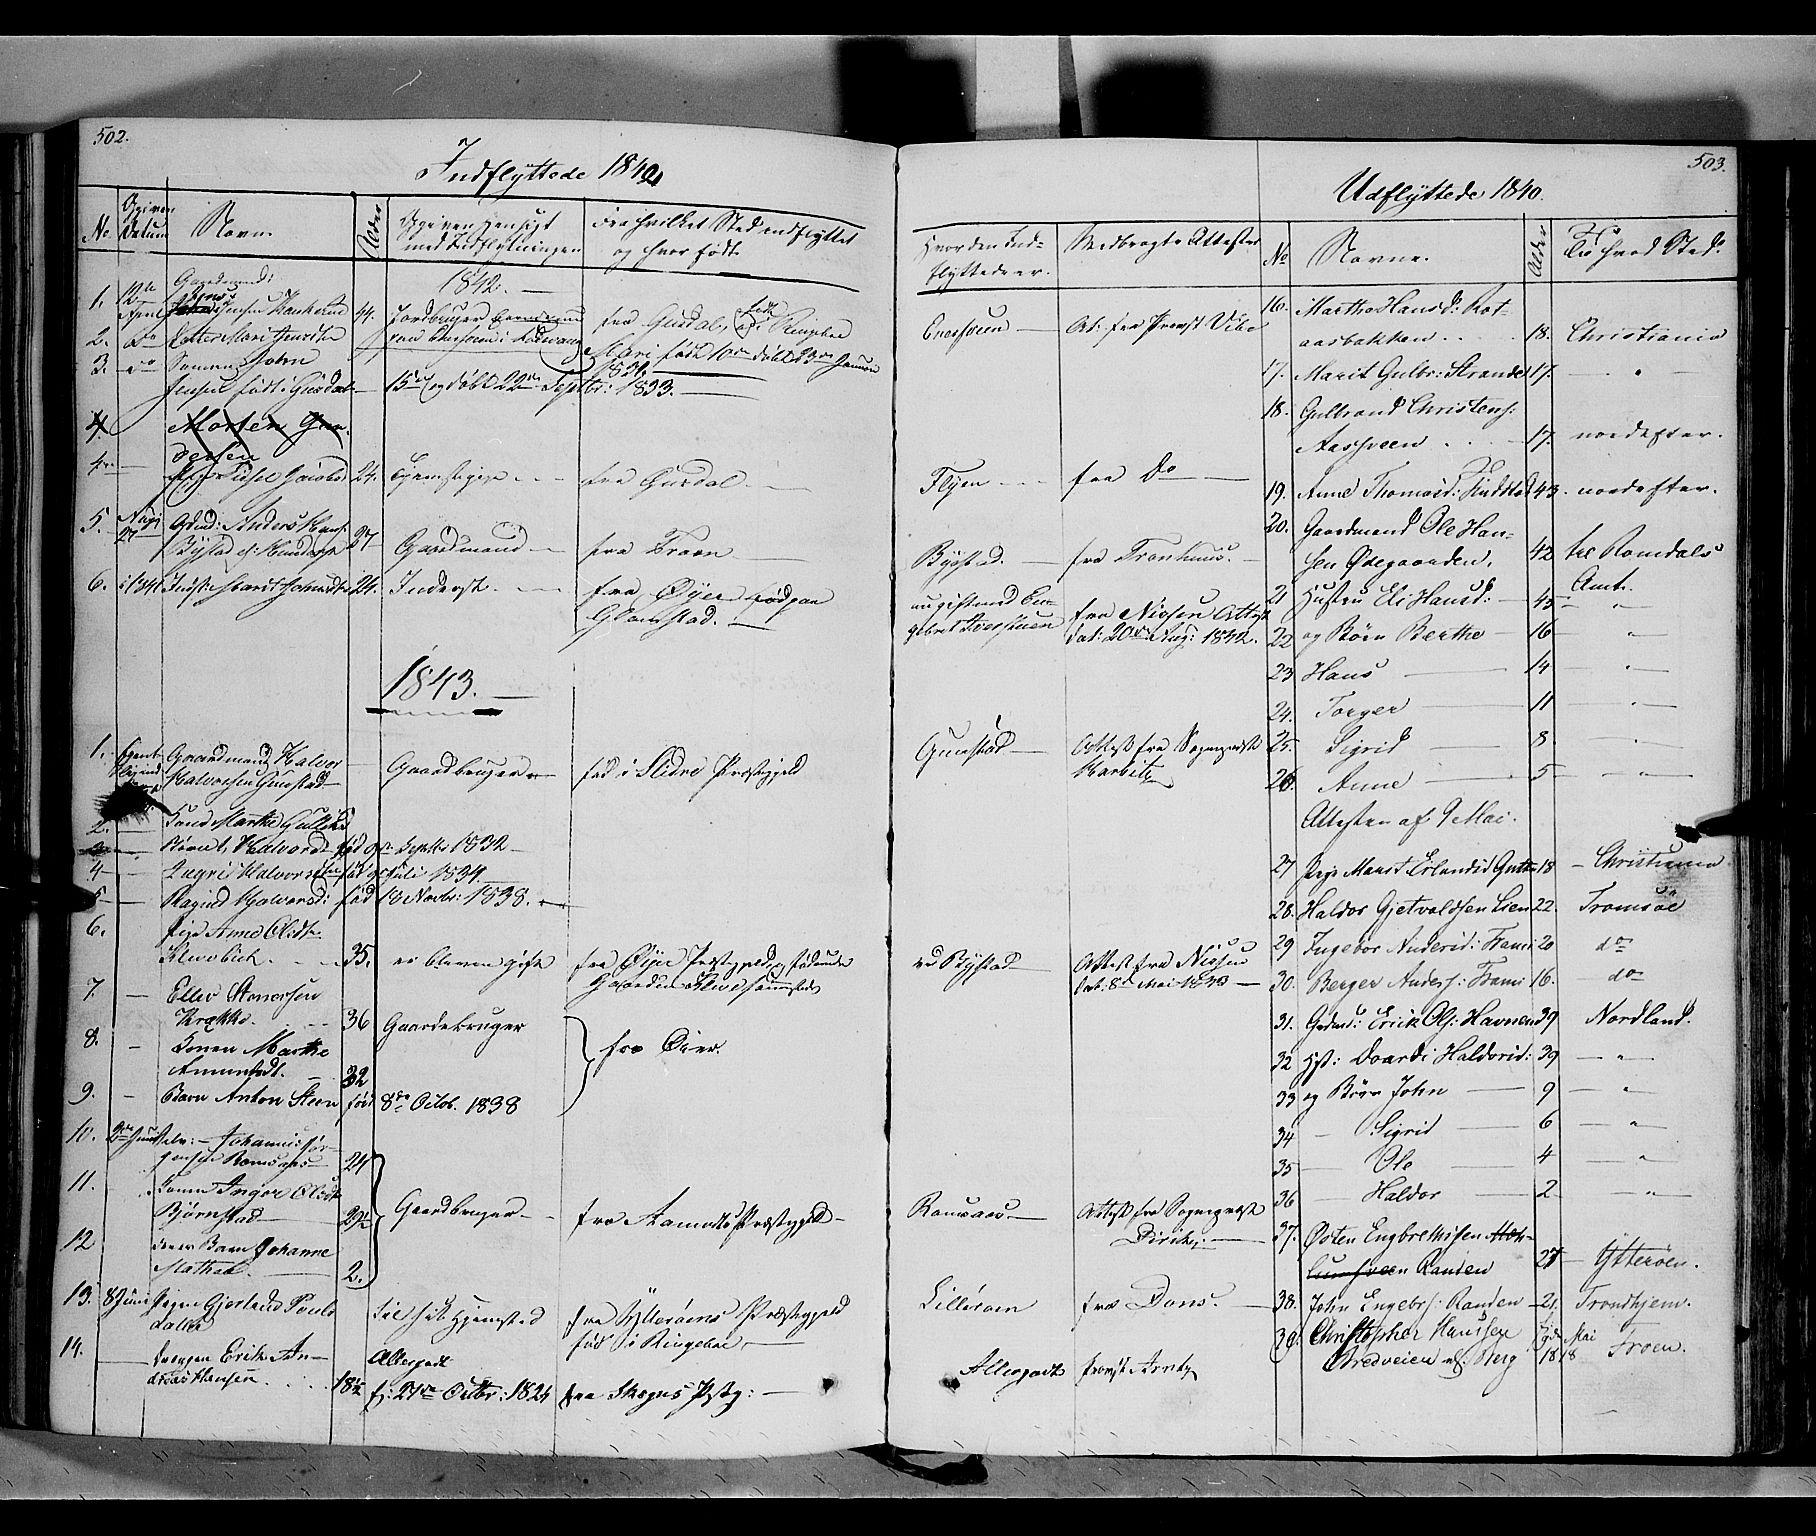 SAH, Ringebu prestekontor, Ministerialbok nr. 5, 1839-1848, s. 502-503